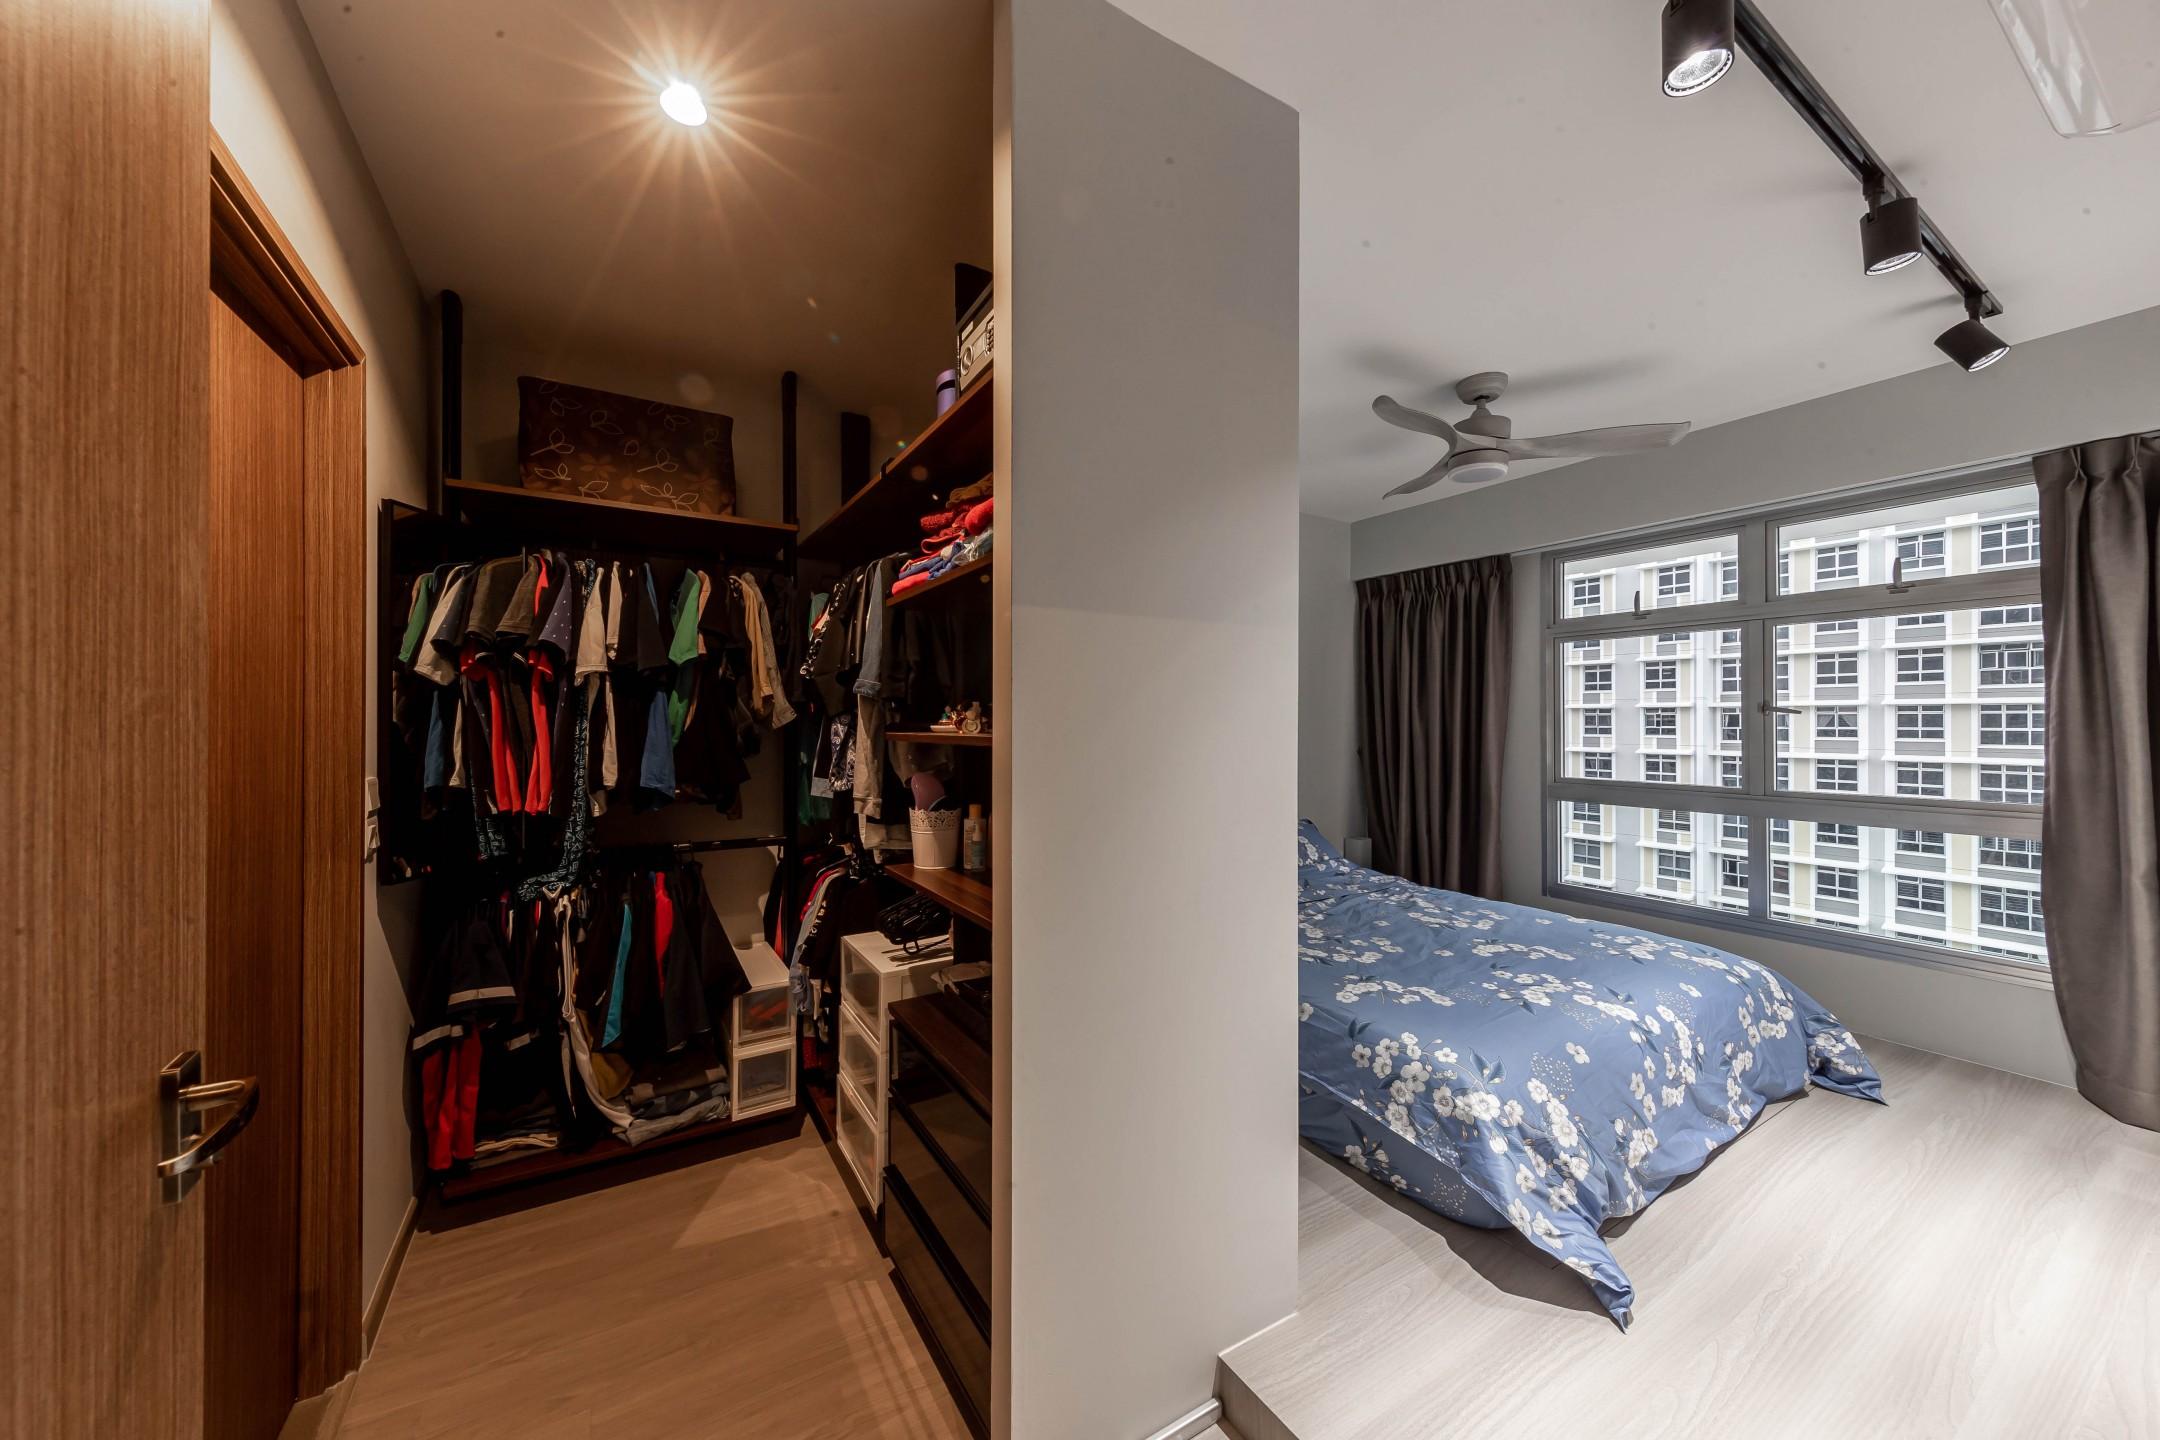 squarerooms renozone northshore industrial home hdb renovation style interior design bedroom walk in wardrobe closet partition